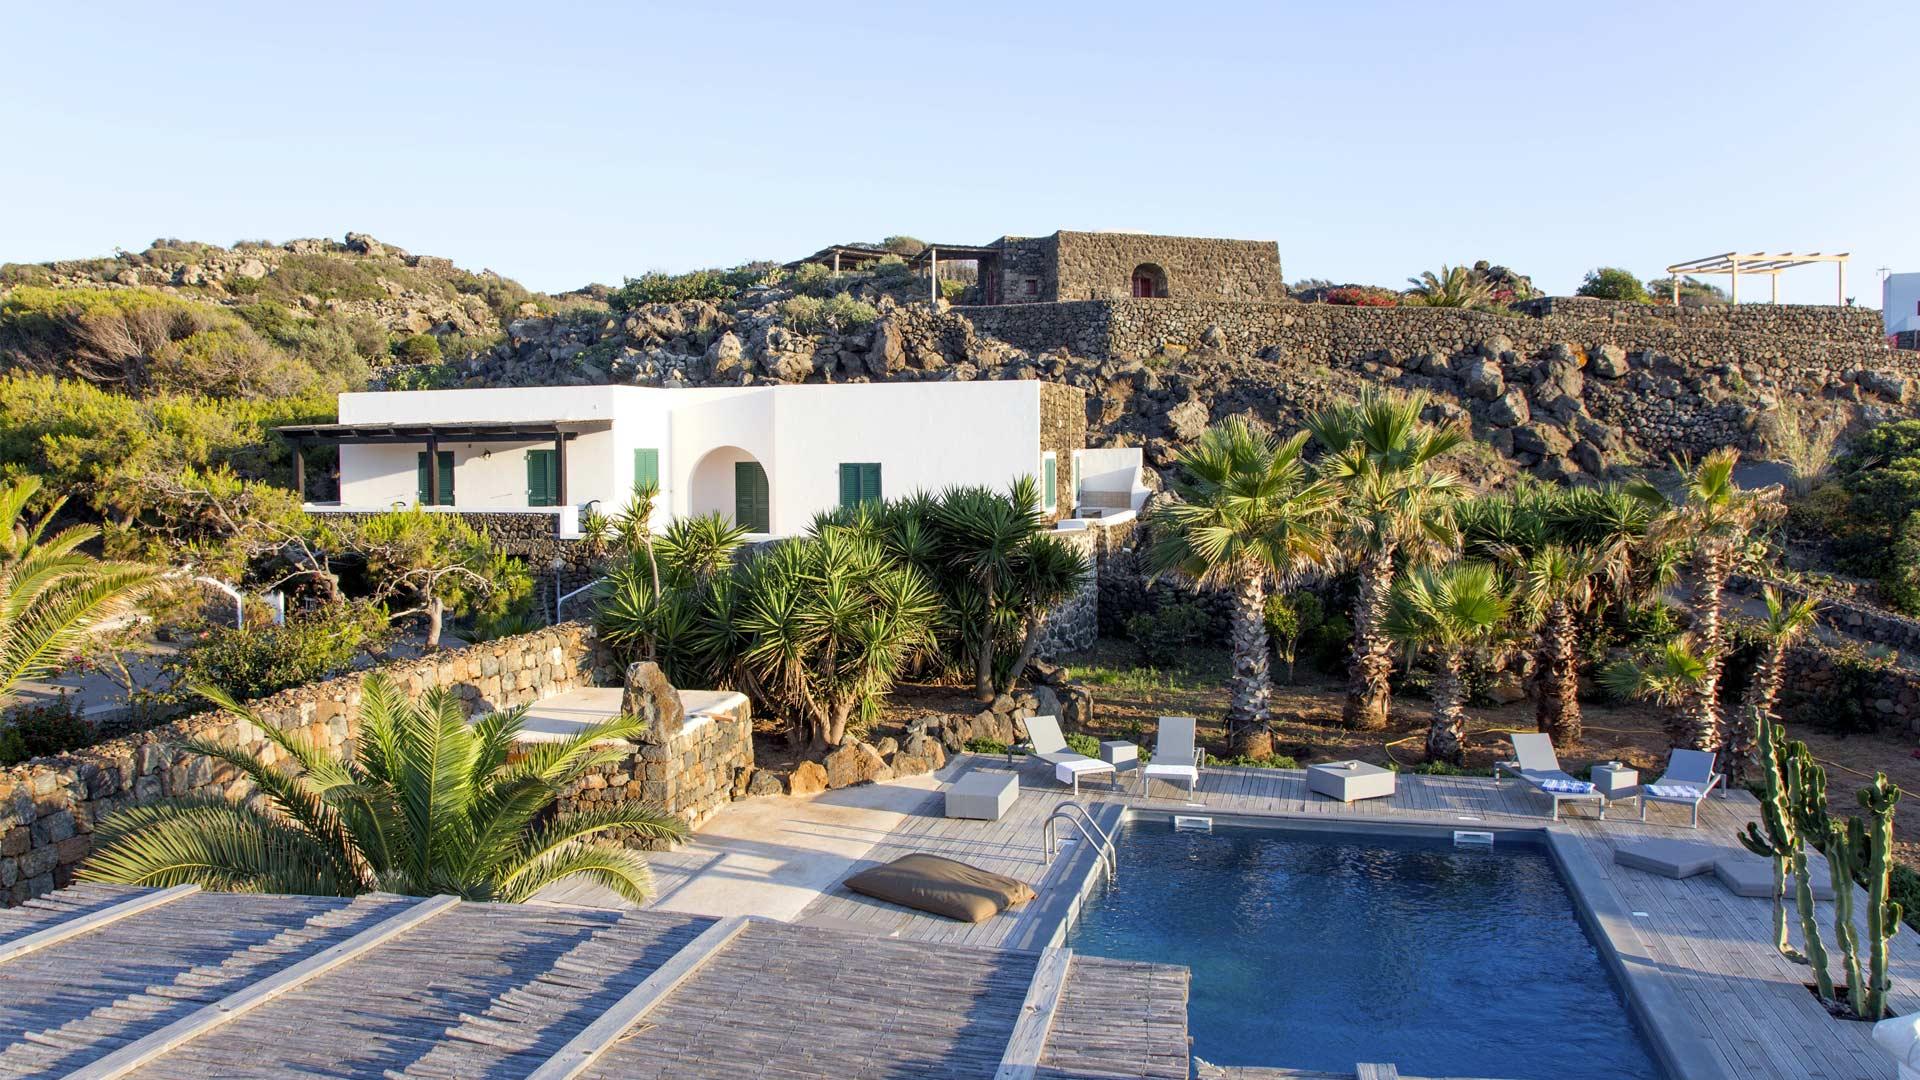 villa dammuso villa mieten in sizilien pantelleria villanovo. Black Bedroom Furniture Sets. Home Design Ideas